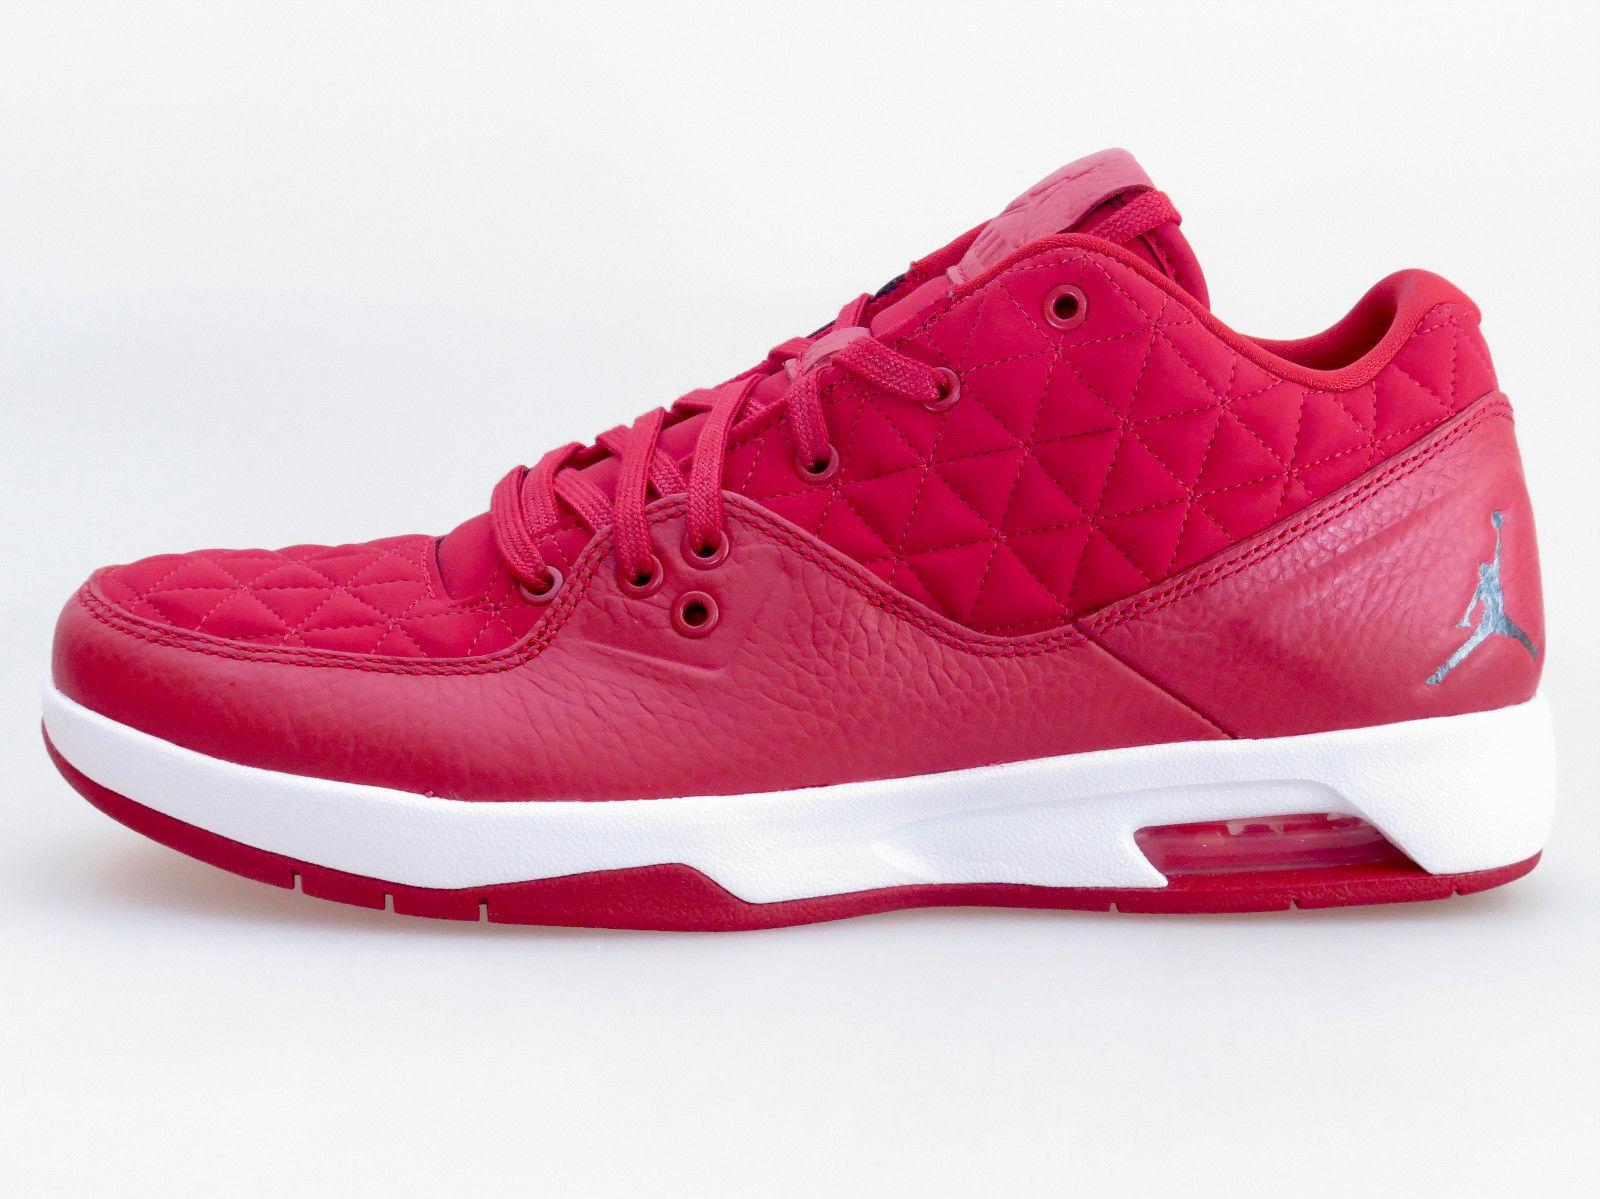 Jordan Clutch Rosso Bianco 845043-603